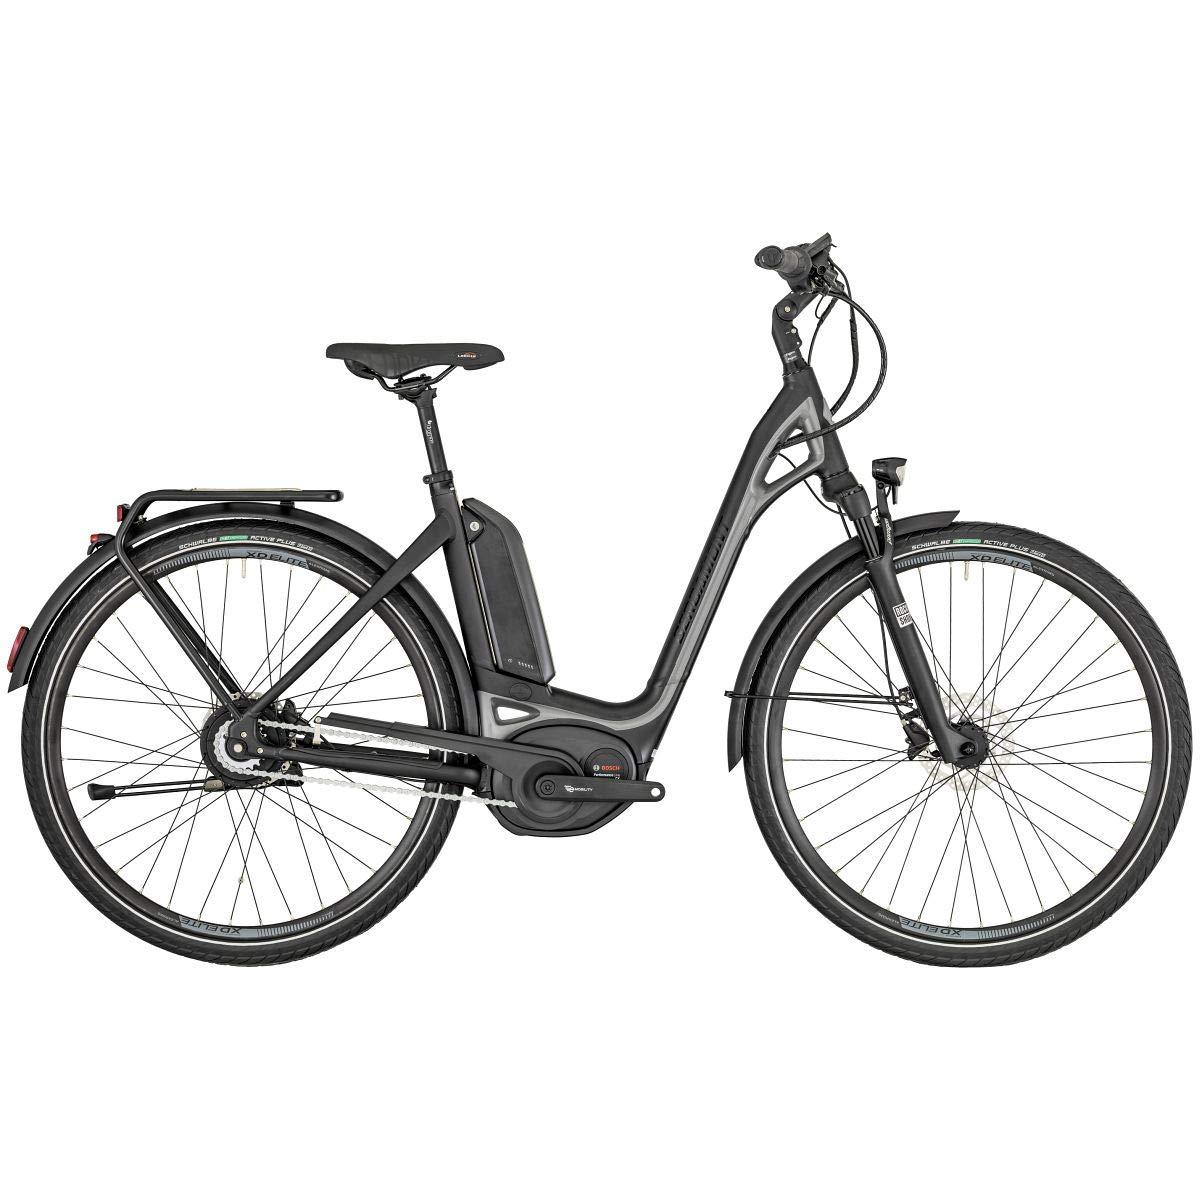 Bergamont E-Ville Pro Pedelec Elektro Trekking Fahrrad schwarz//grau 2019